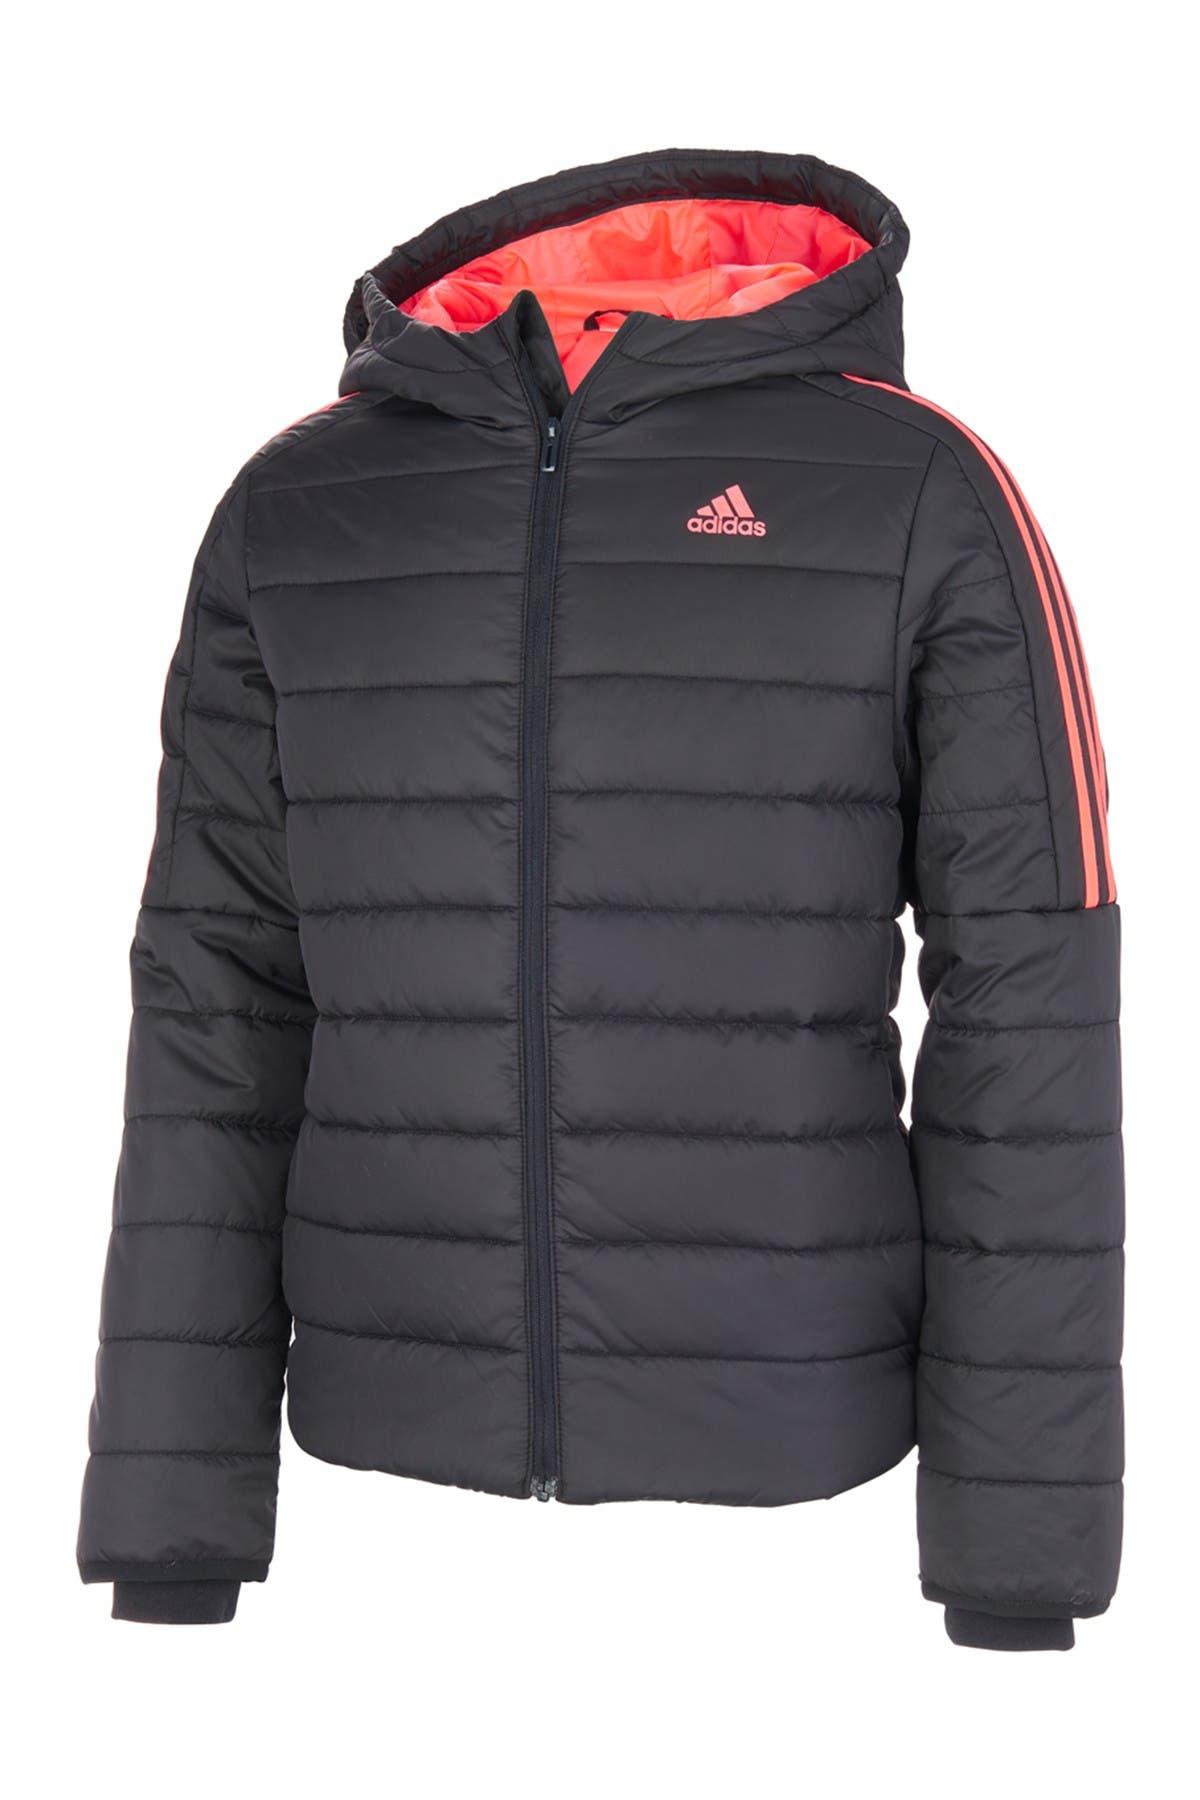 Image of adidas Classic Puffer Jacket